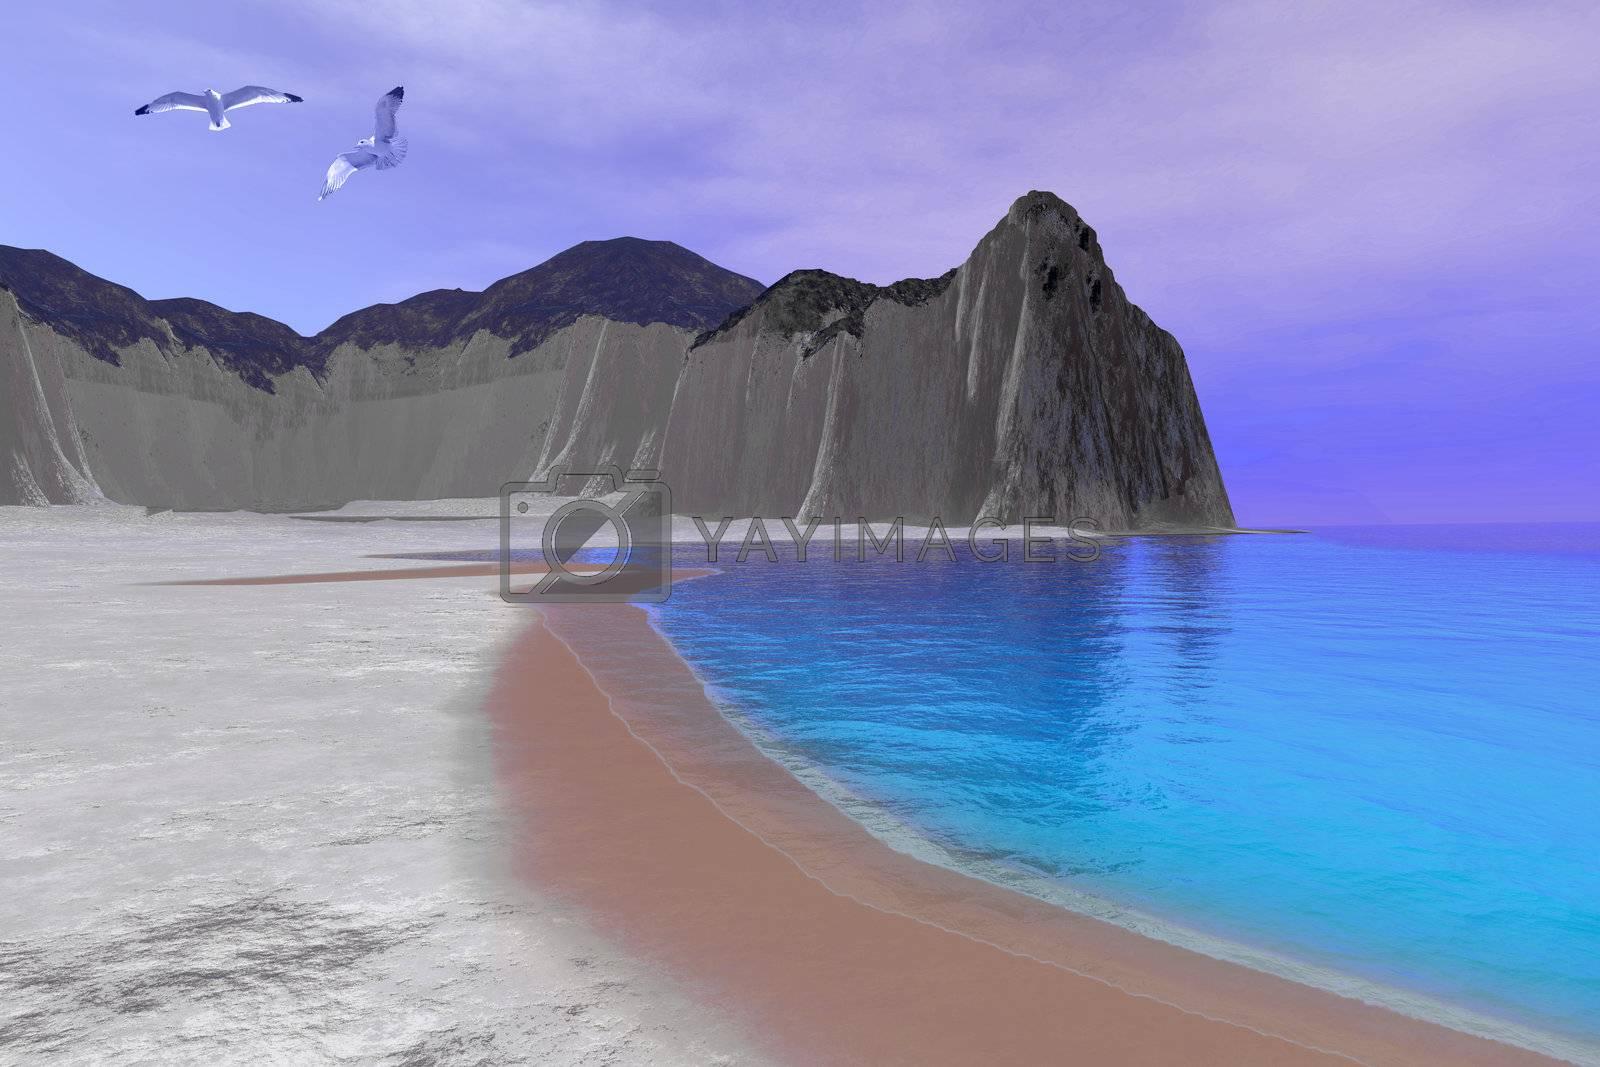 Royalty free image of SIMONE BEACH by Catmando